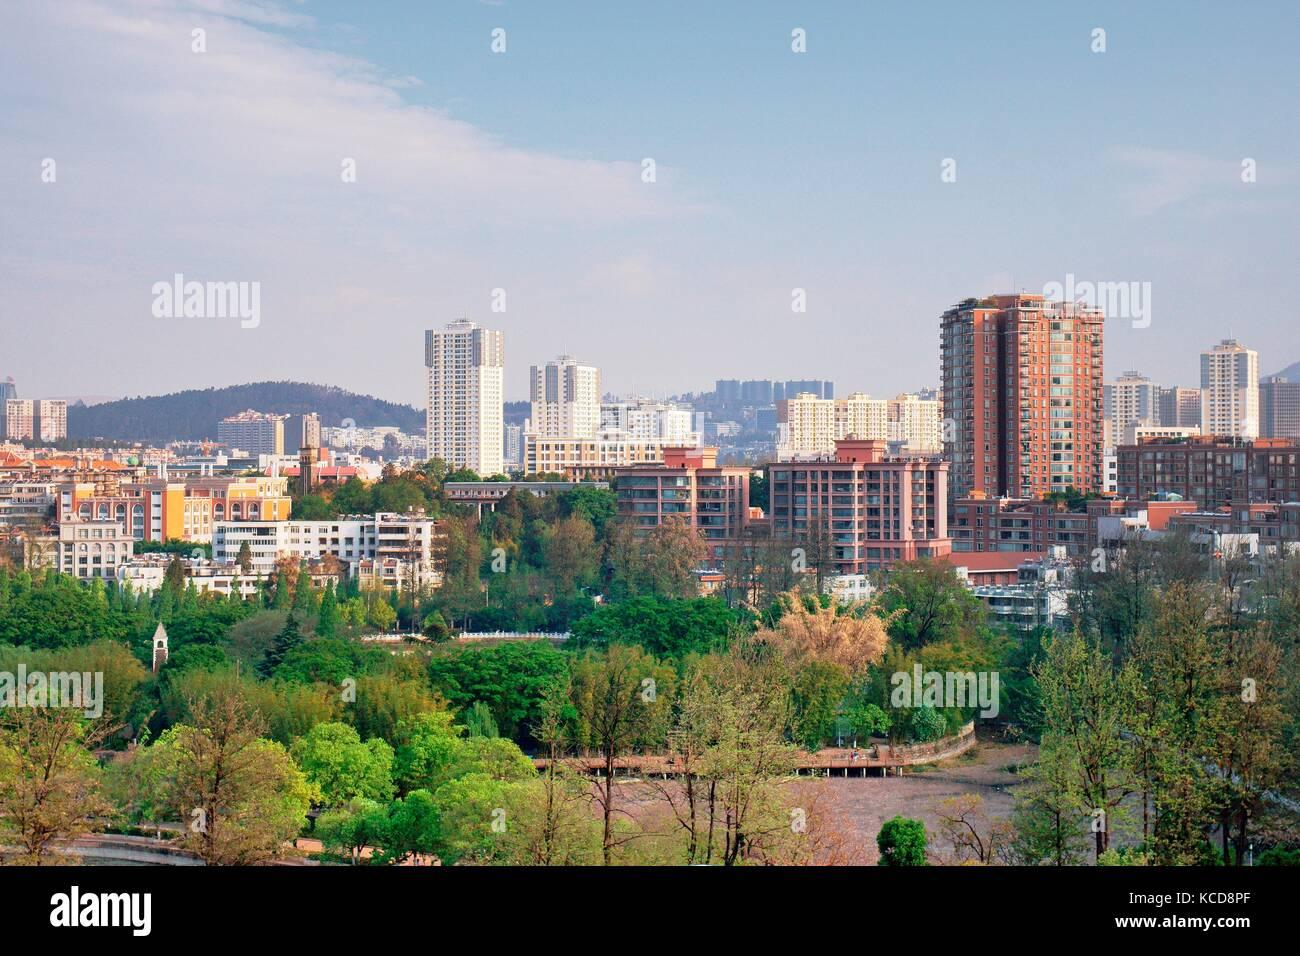 Kunming city centre, Yunnan Province, China. Looking south over Green Lake Park. - Stock Image